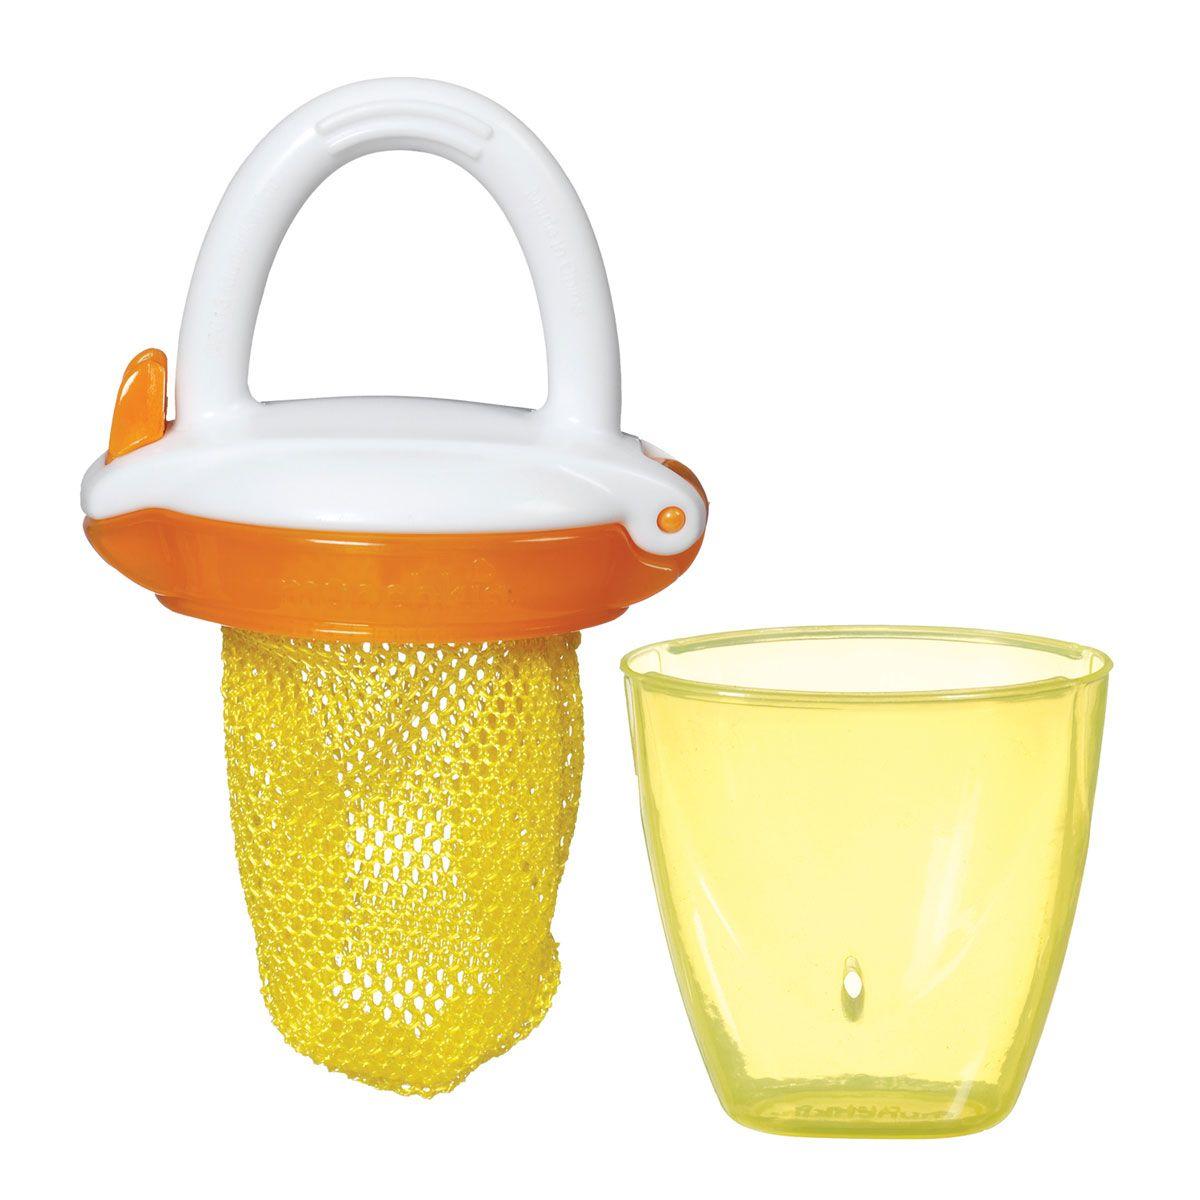 Alimentador Amarelo e Laranja com Tampa - Munchkin